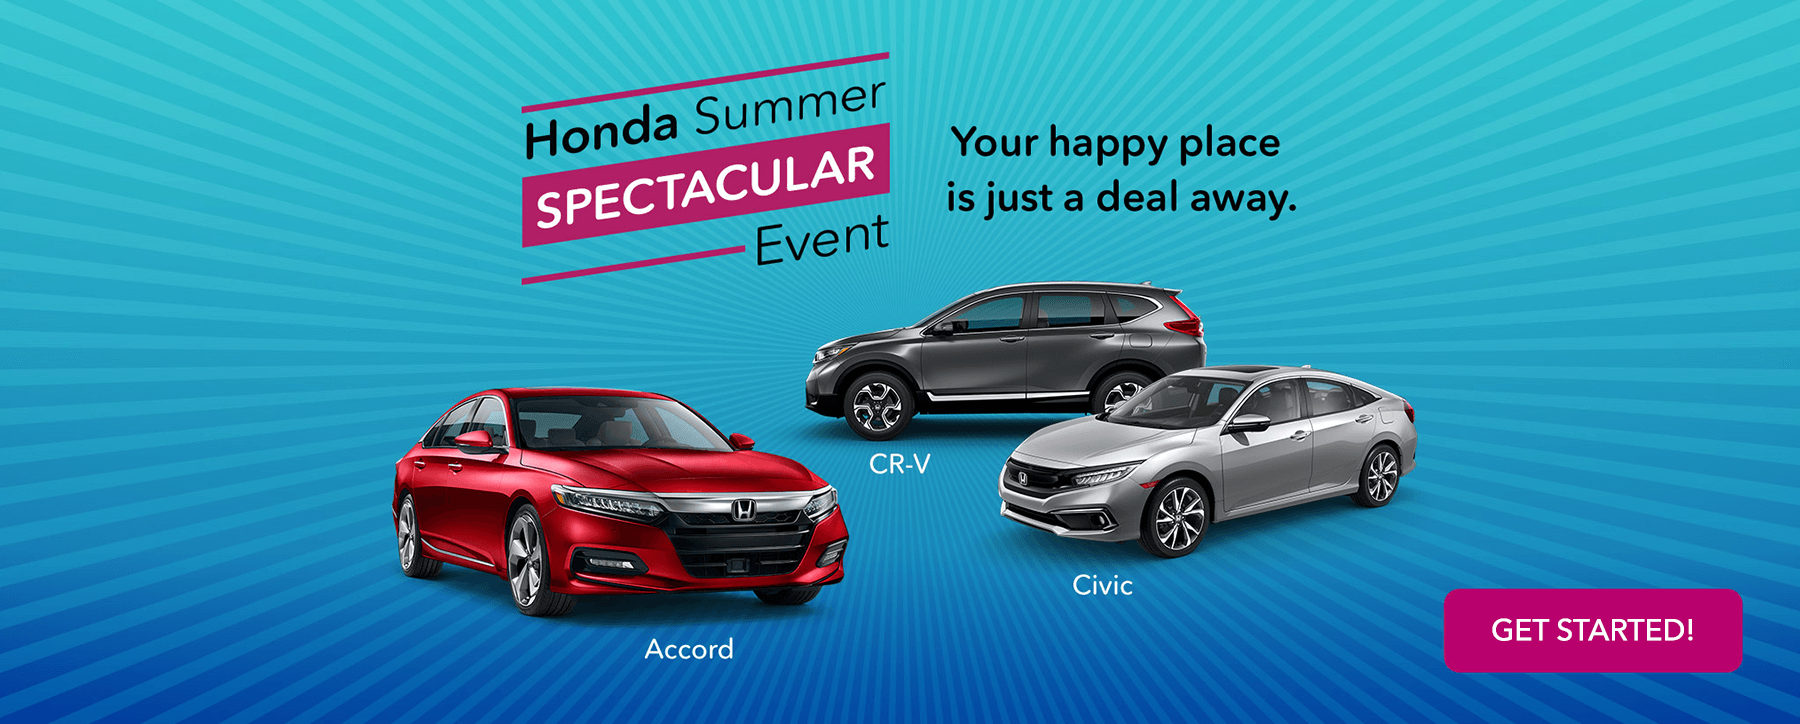 2019 Honda Summer Spectacular Event Slider